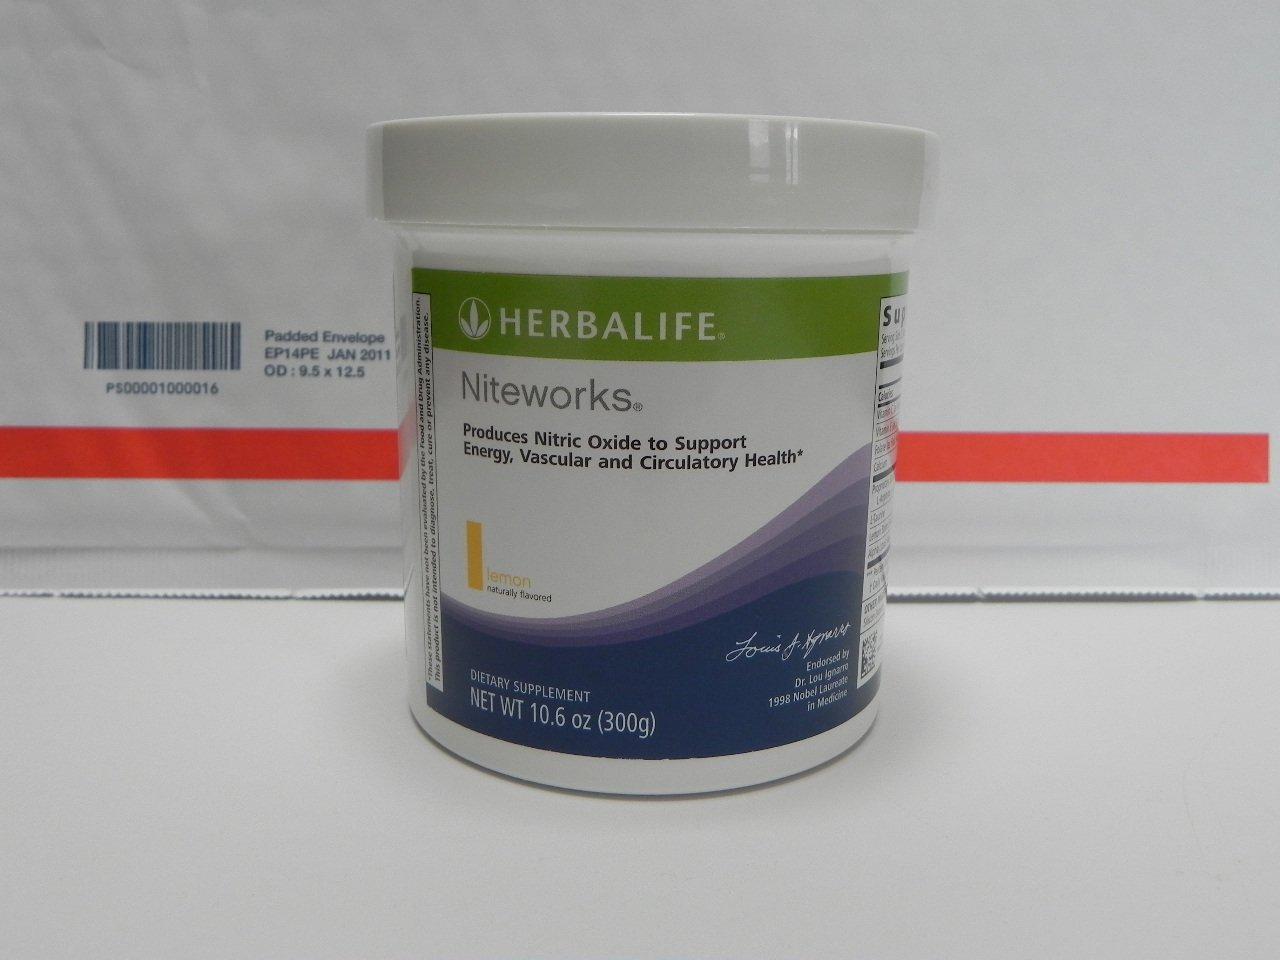 Herbalife Niteworks Cardio Supplement Lemon 300g 10.6oz 2012